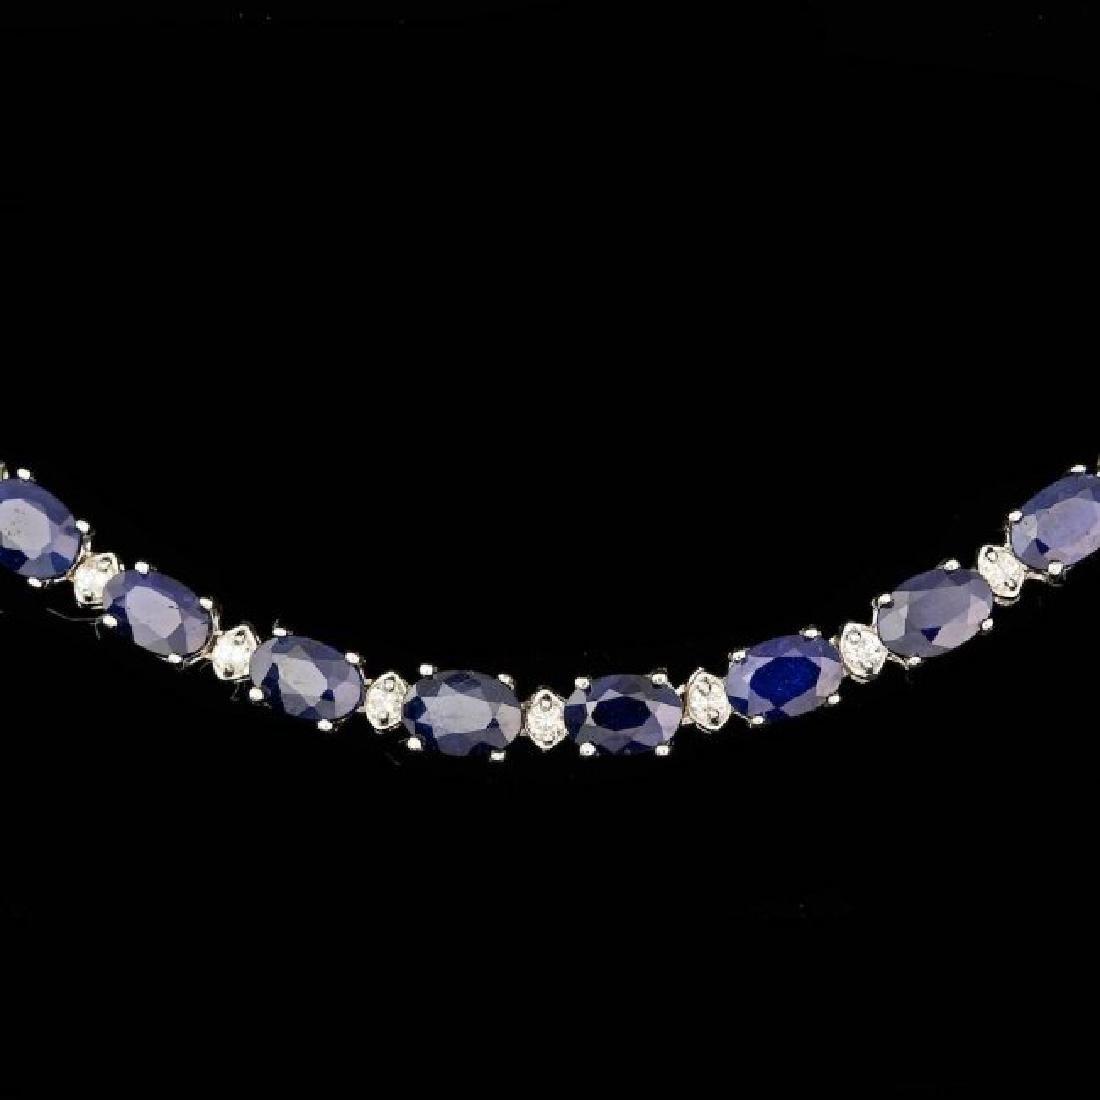 14k Gold 30.00ct Sapphire 1.35ct Diamond Necklace - 2